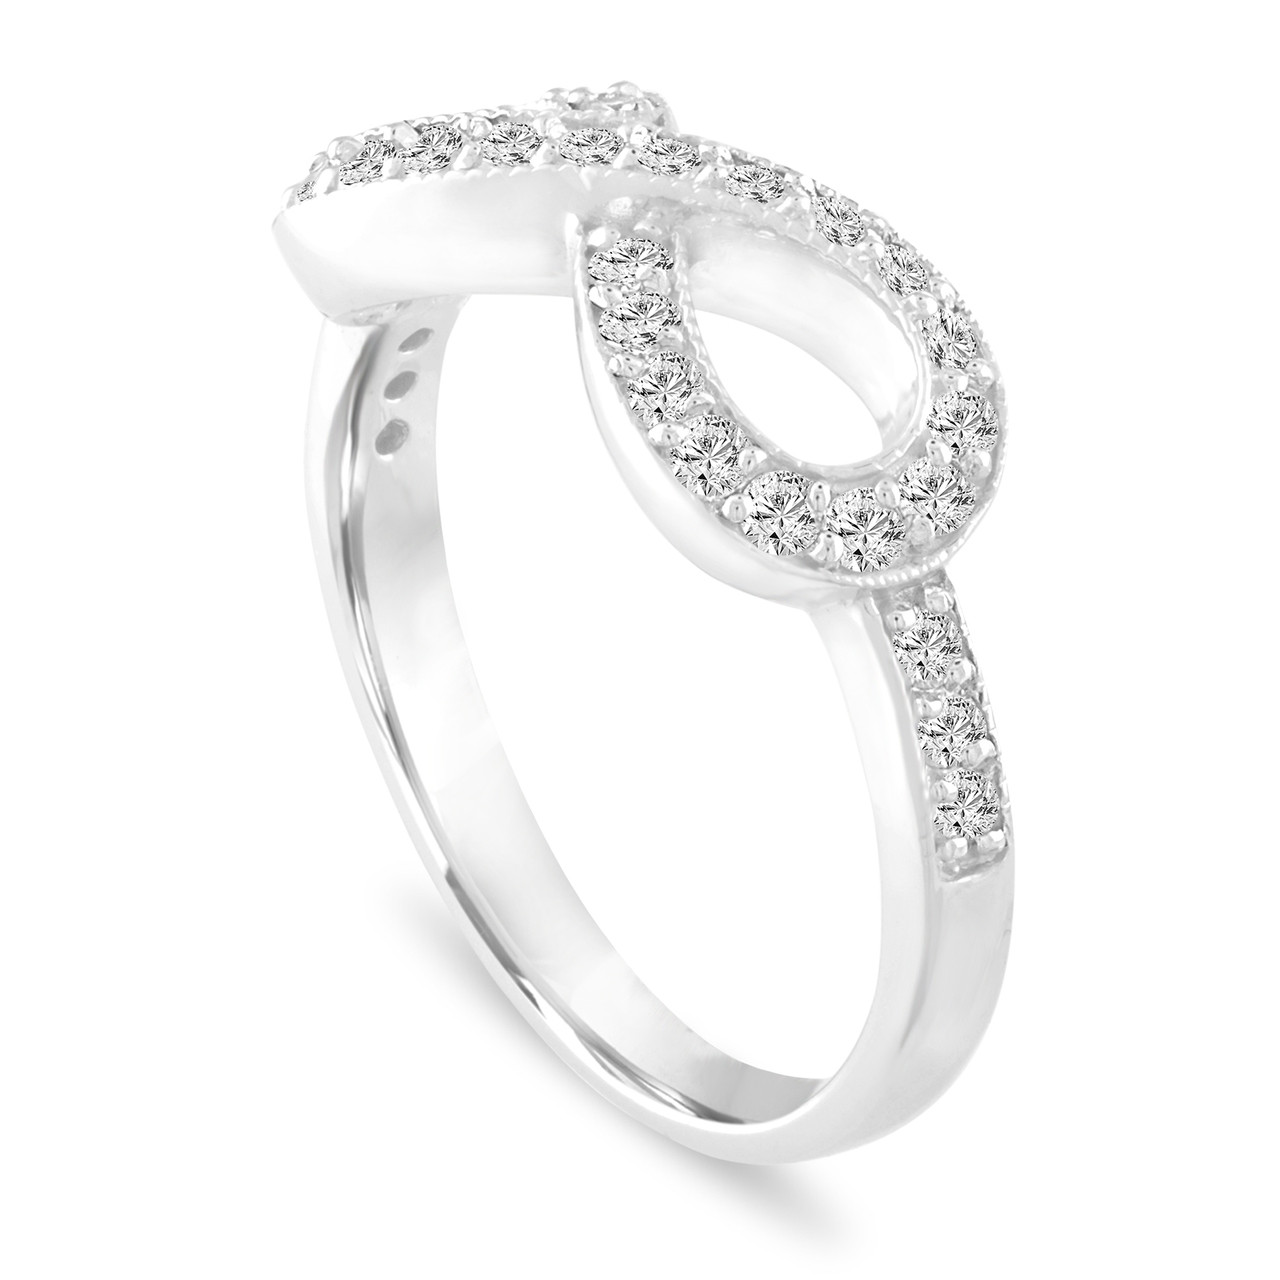 d31c53bed7aab Platinum Infinity Diamond Ring, Infinity Wedding Band, Pave Anniversary  Diamond Ring, 0.50 Carat Handmade